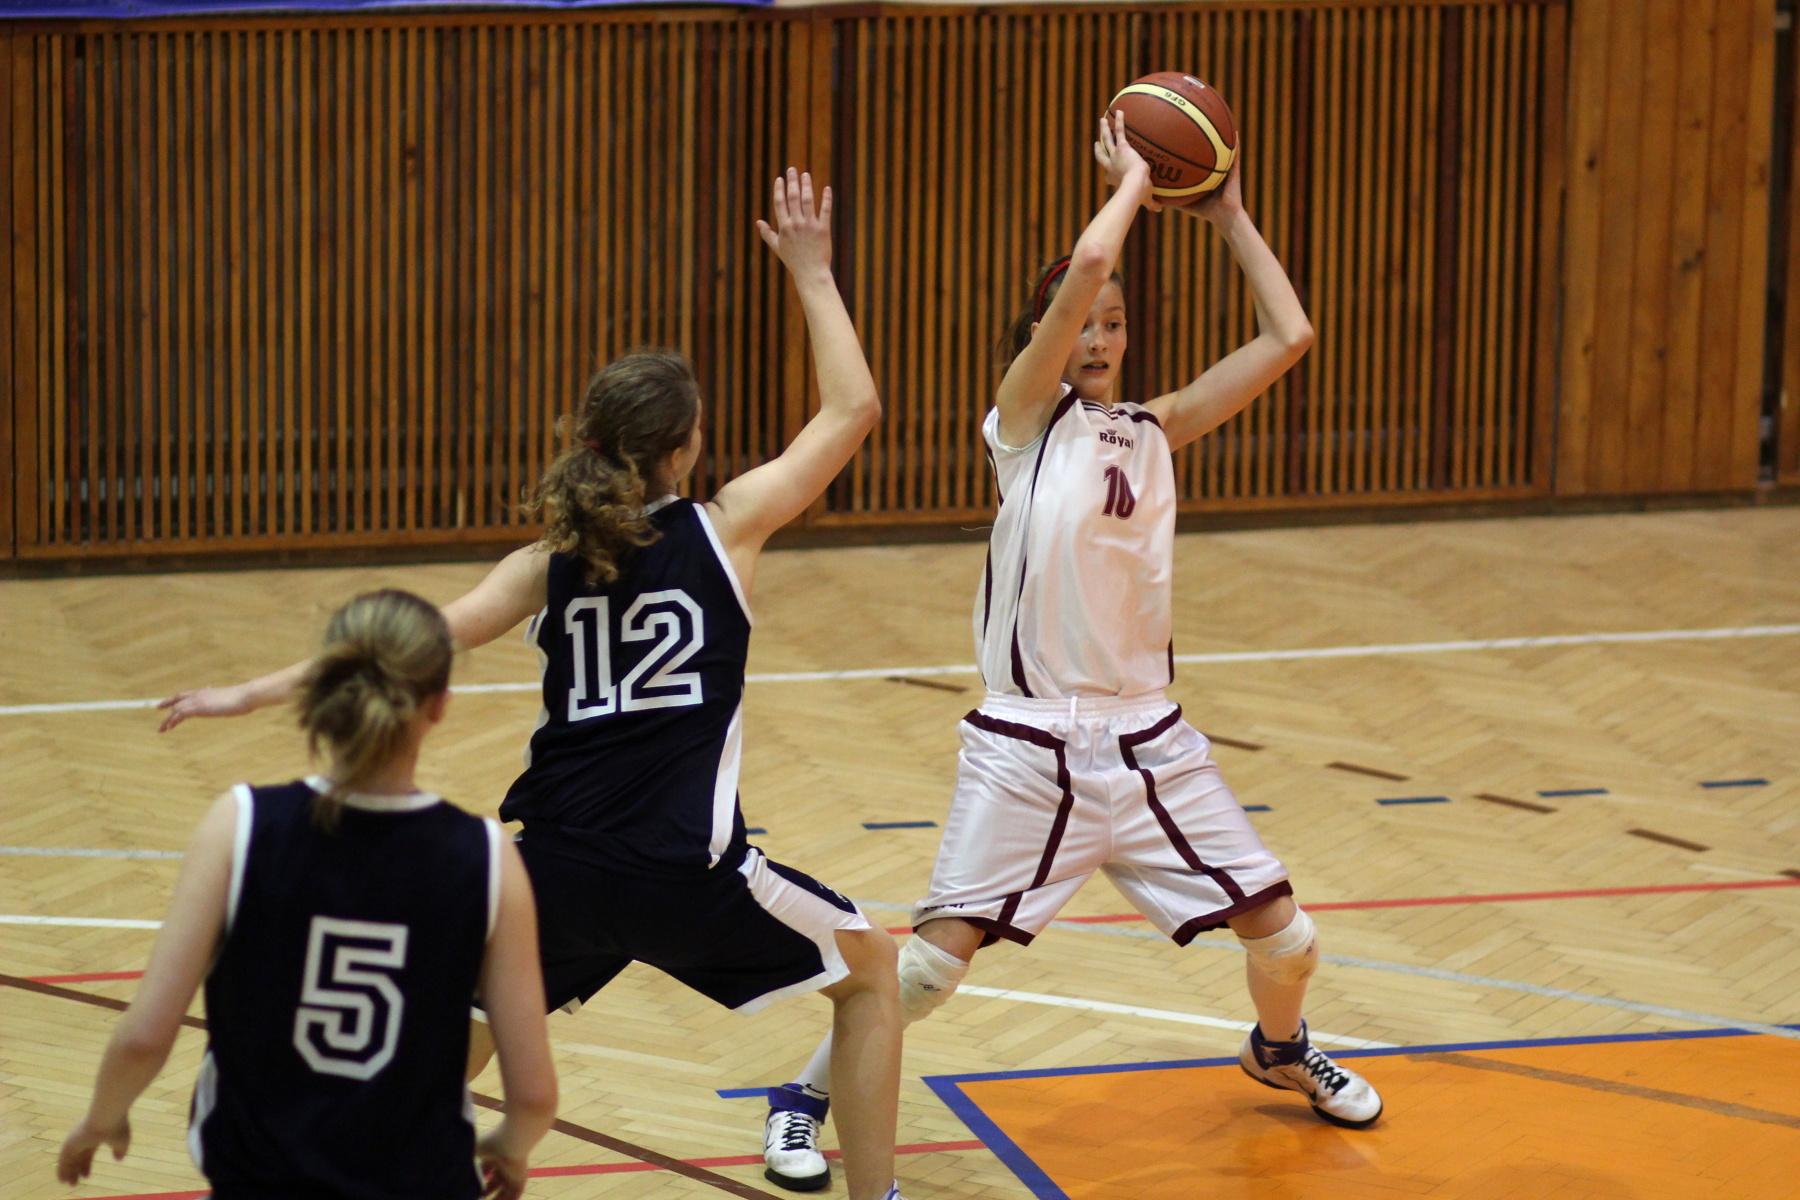 bk-zvolen-bk-petrzalka-ziacky-basketbal-18